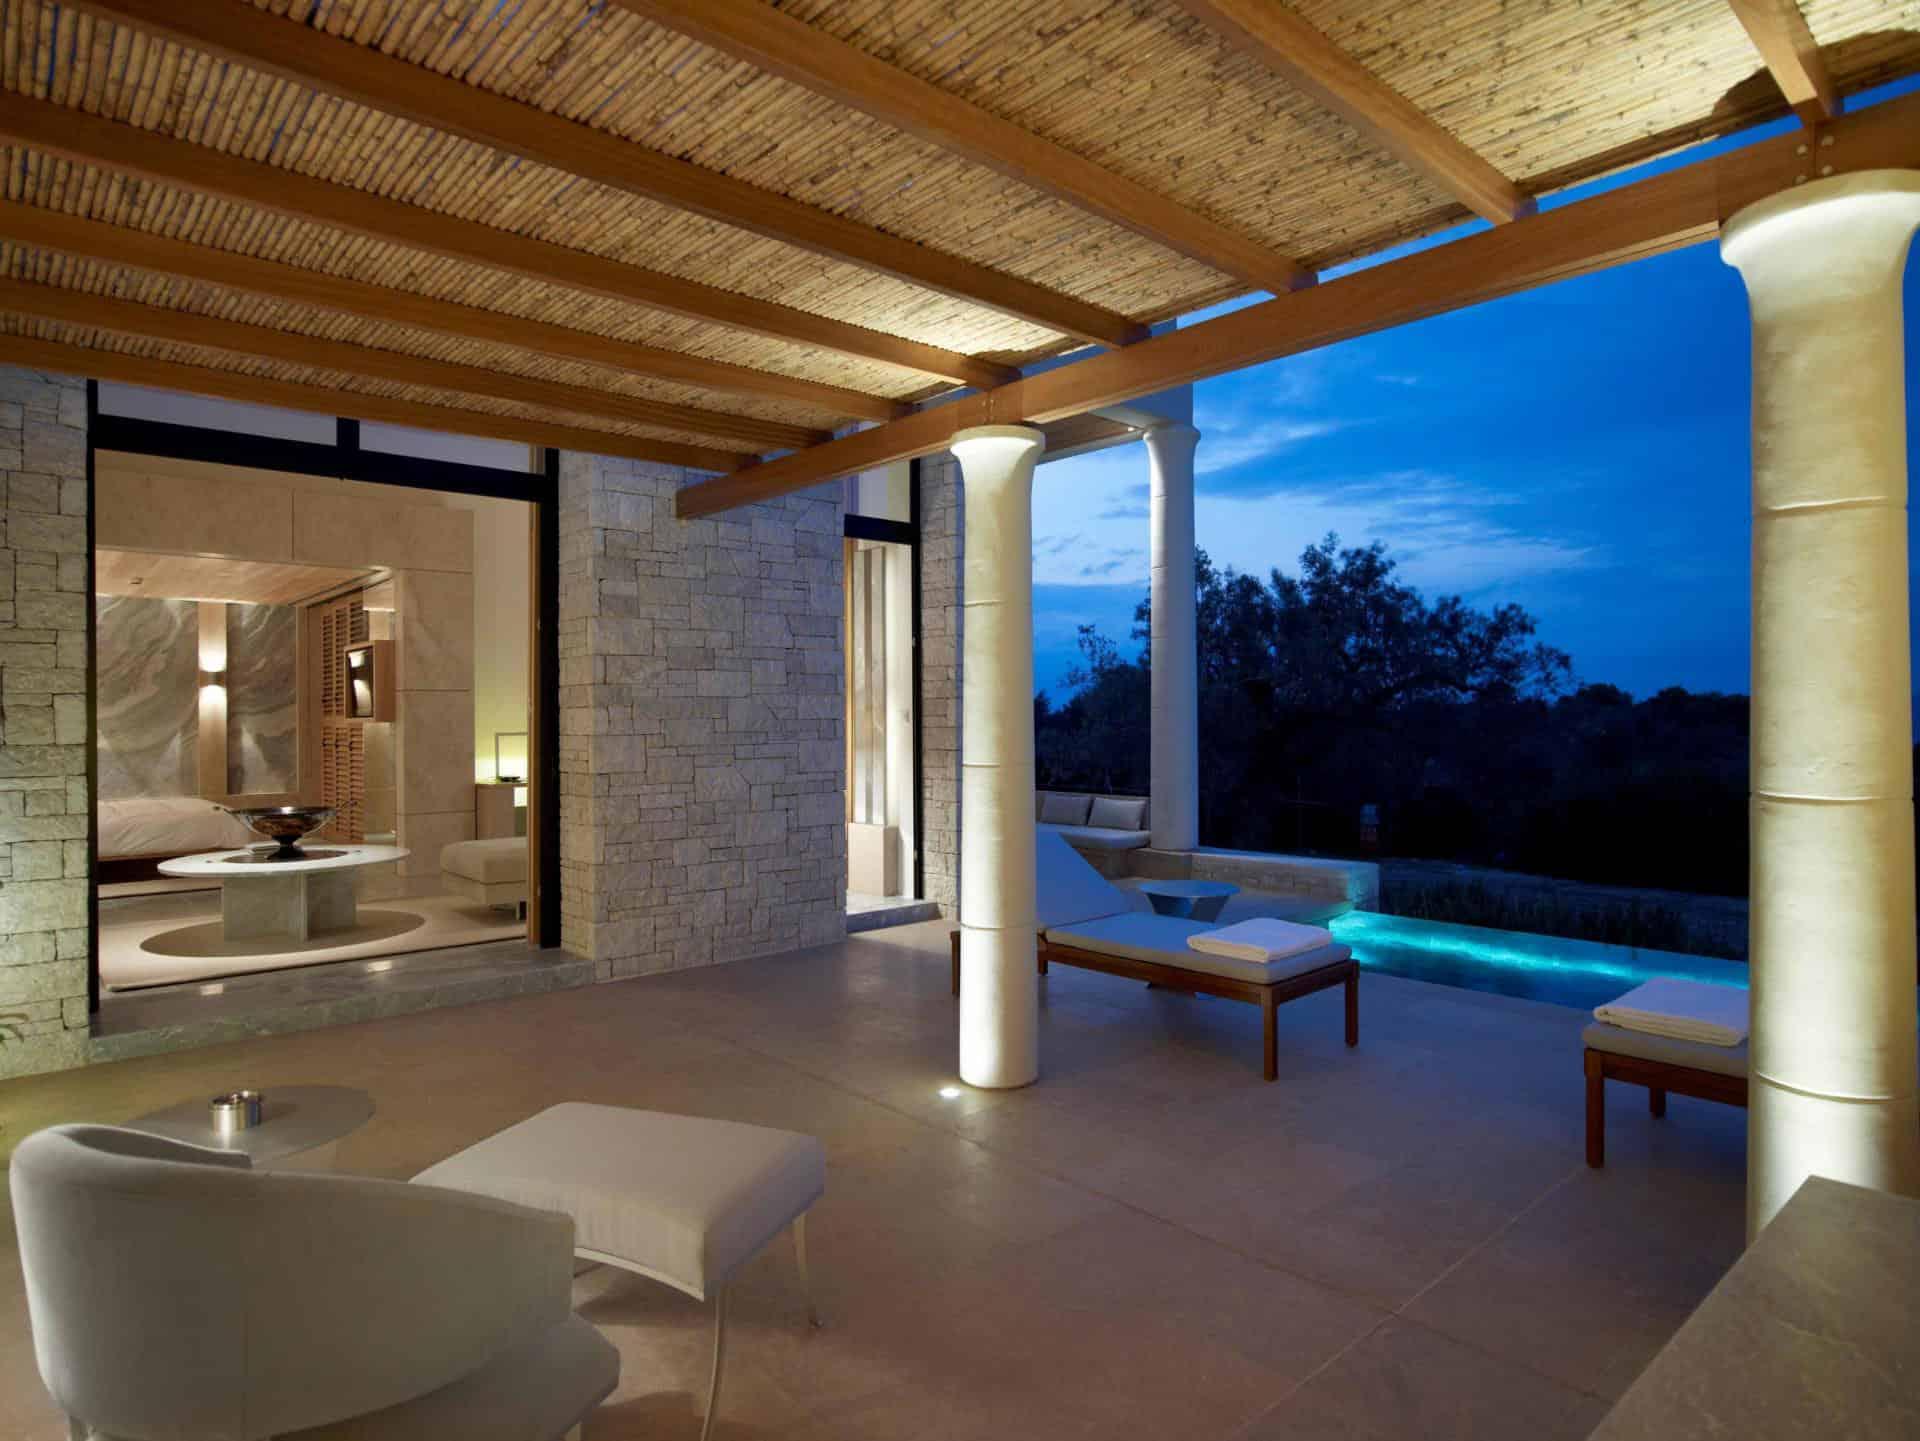 Aman Villas at Amanzoe by Dolphin Capital Investors